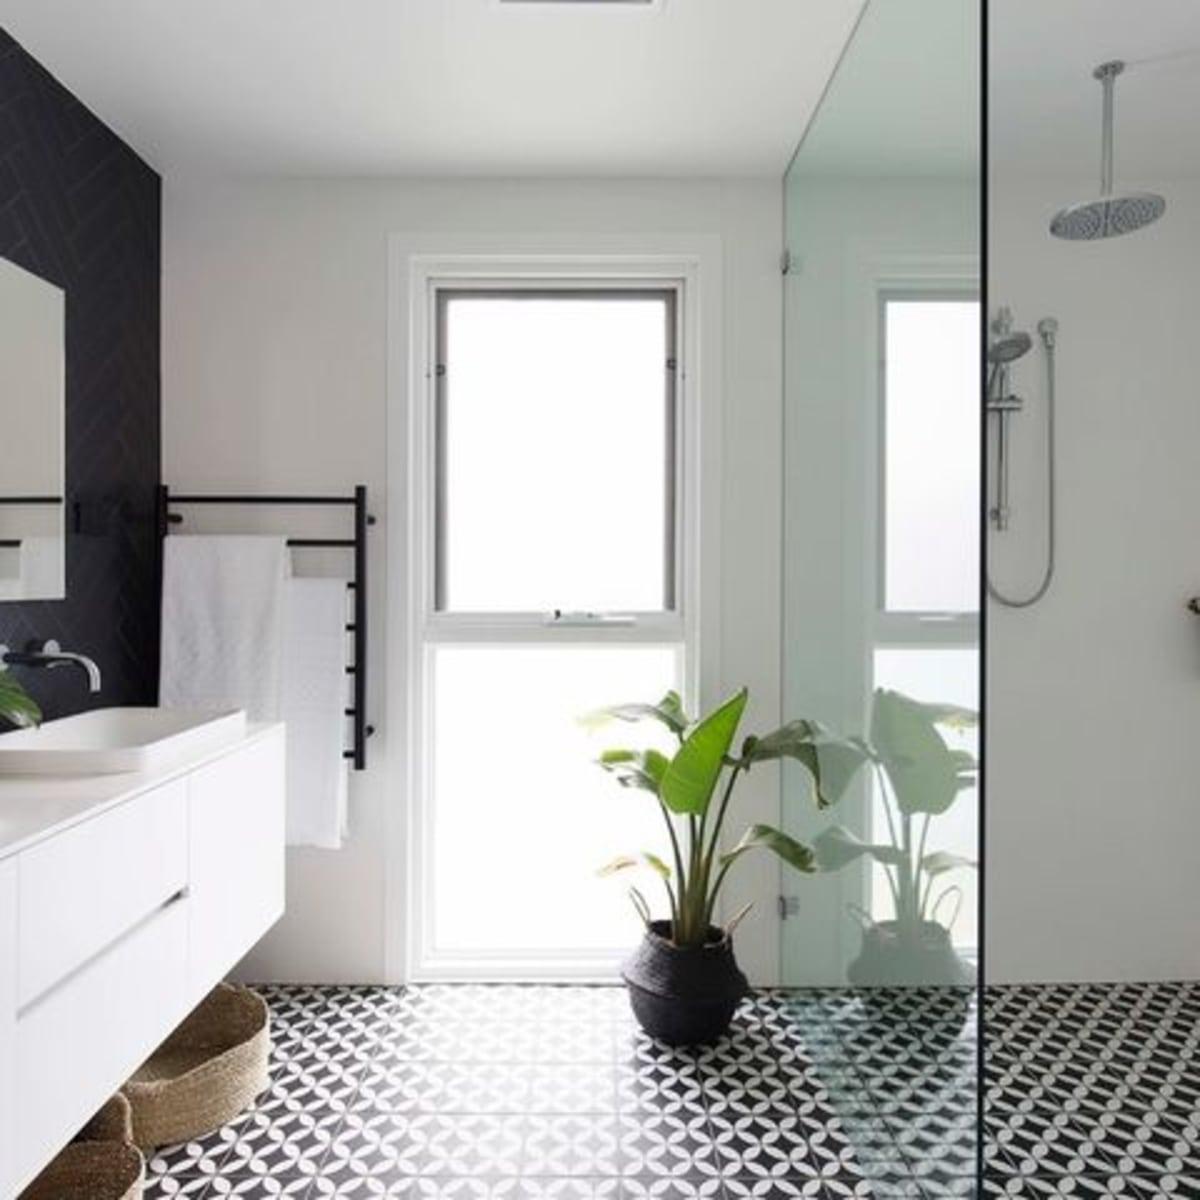 Houzz Bathroom Remodel Tiled Shower